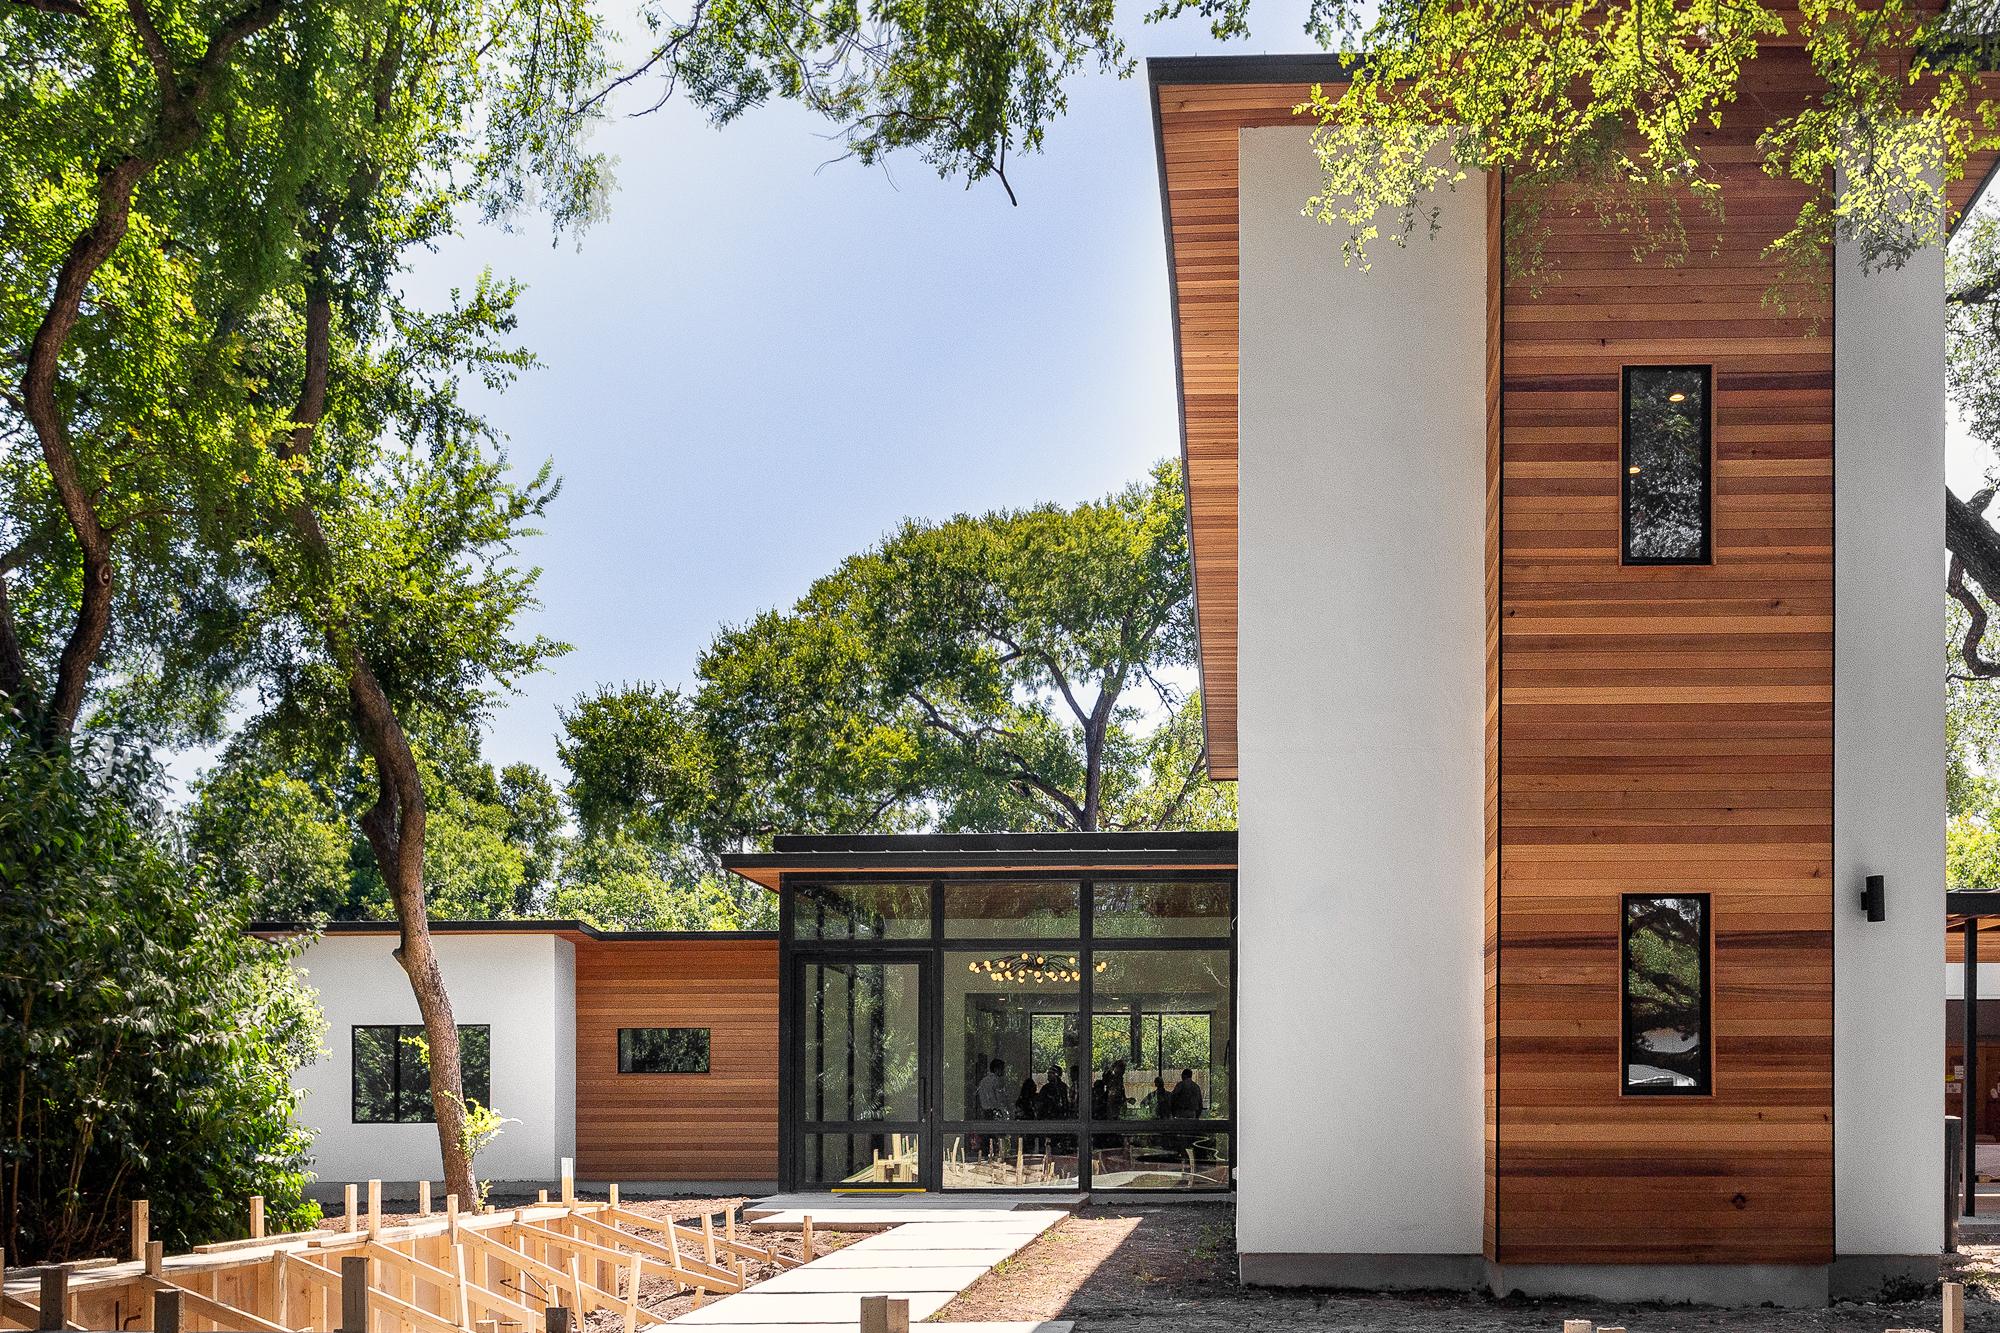 Woodridge-San-Antonio-Architecture-Photography-7.jpg